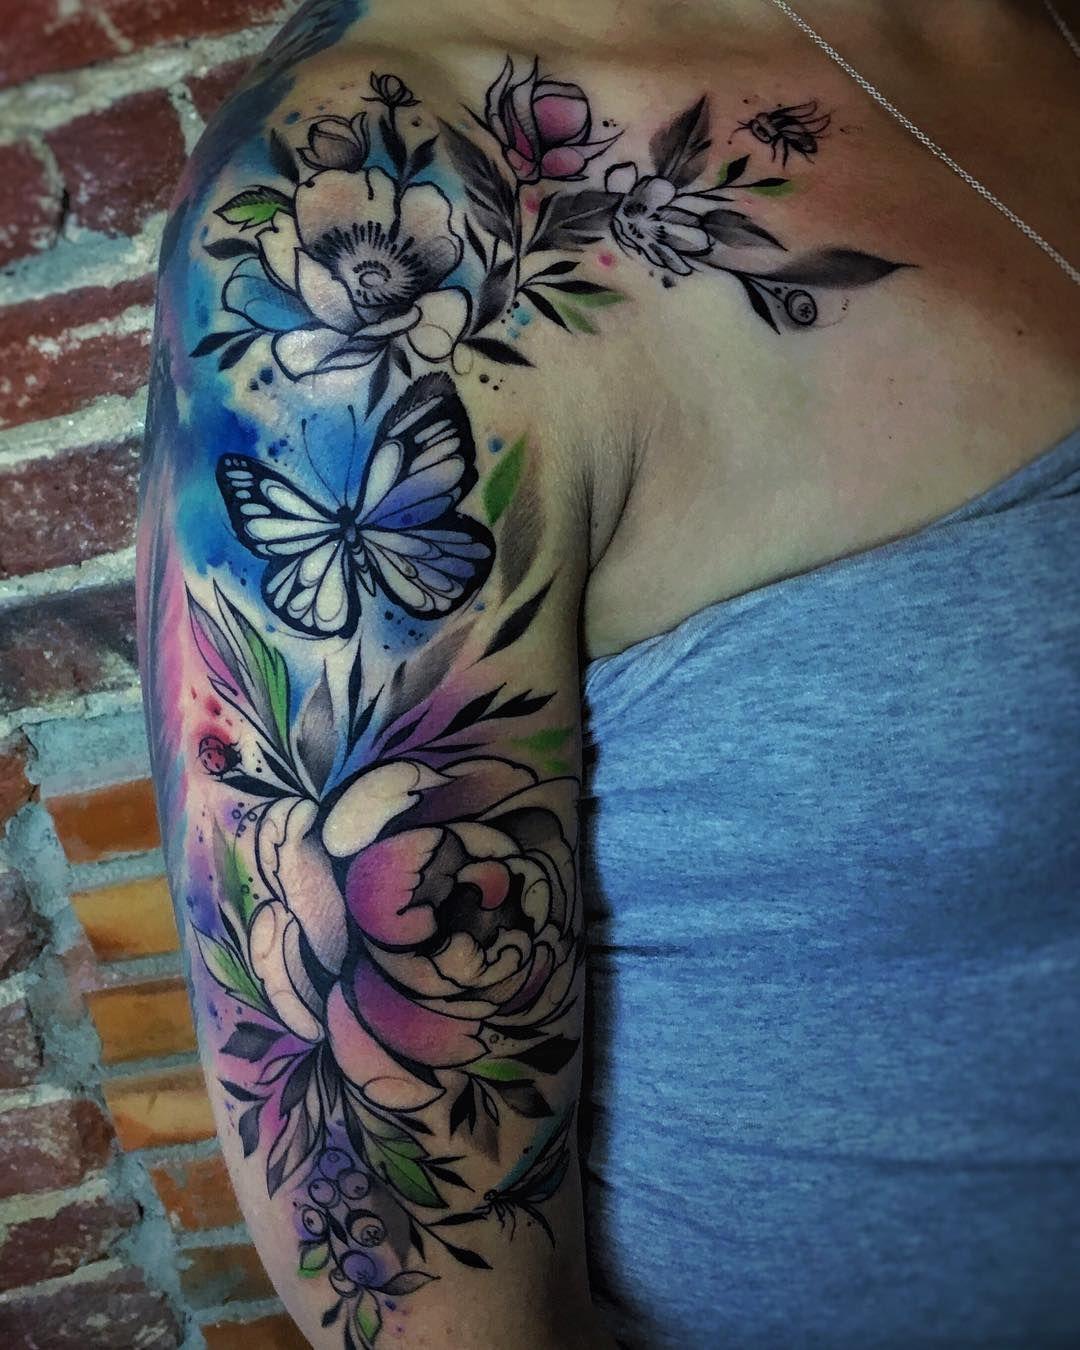 Watercolor Half Sleeve Watercolor Tattoo Sleeve Sleeve Tattoos Tattoo Sleeve Designs